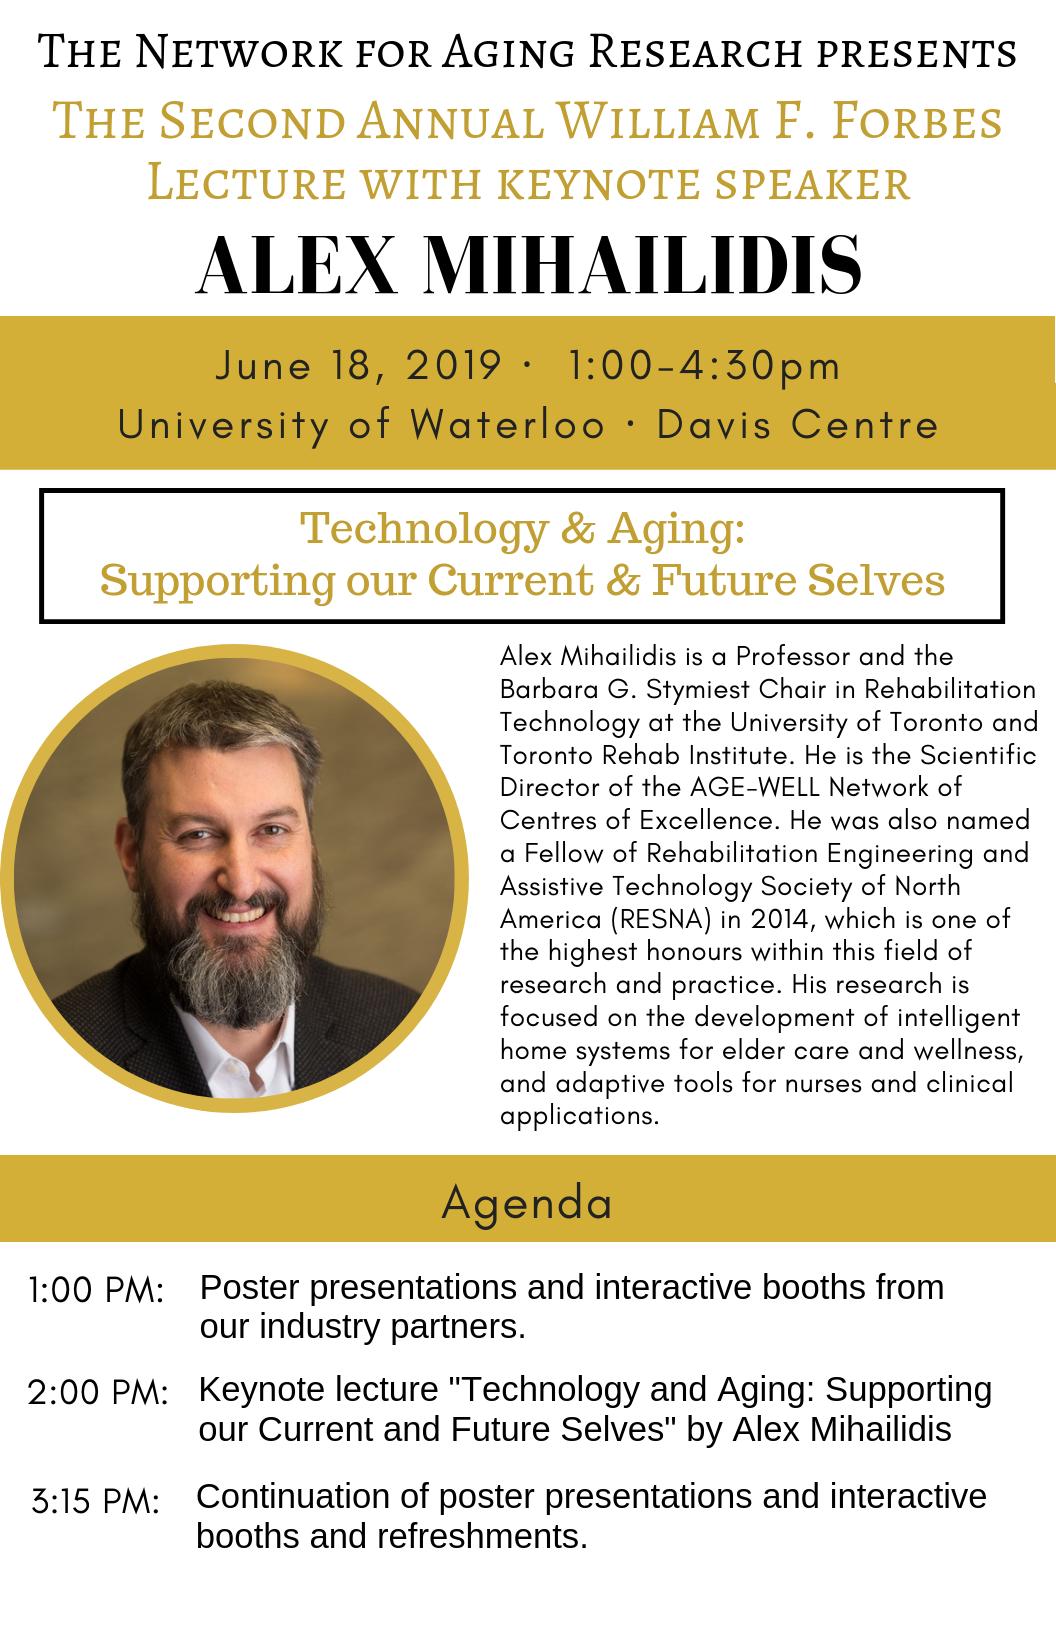 Alex Mihailidis keynote speaker June 18, 1pm-430pm